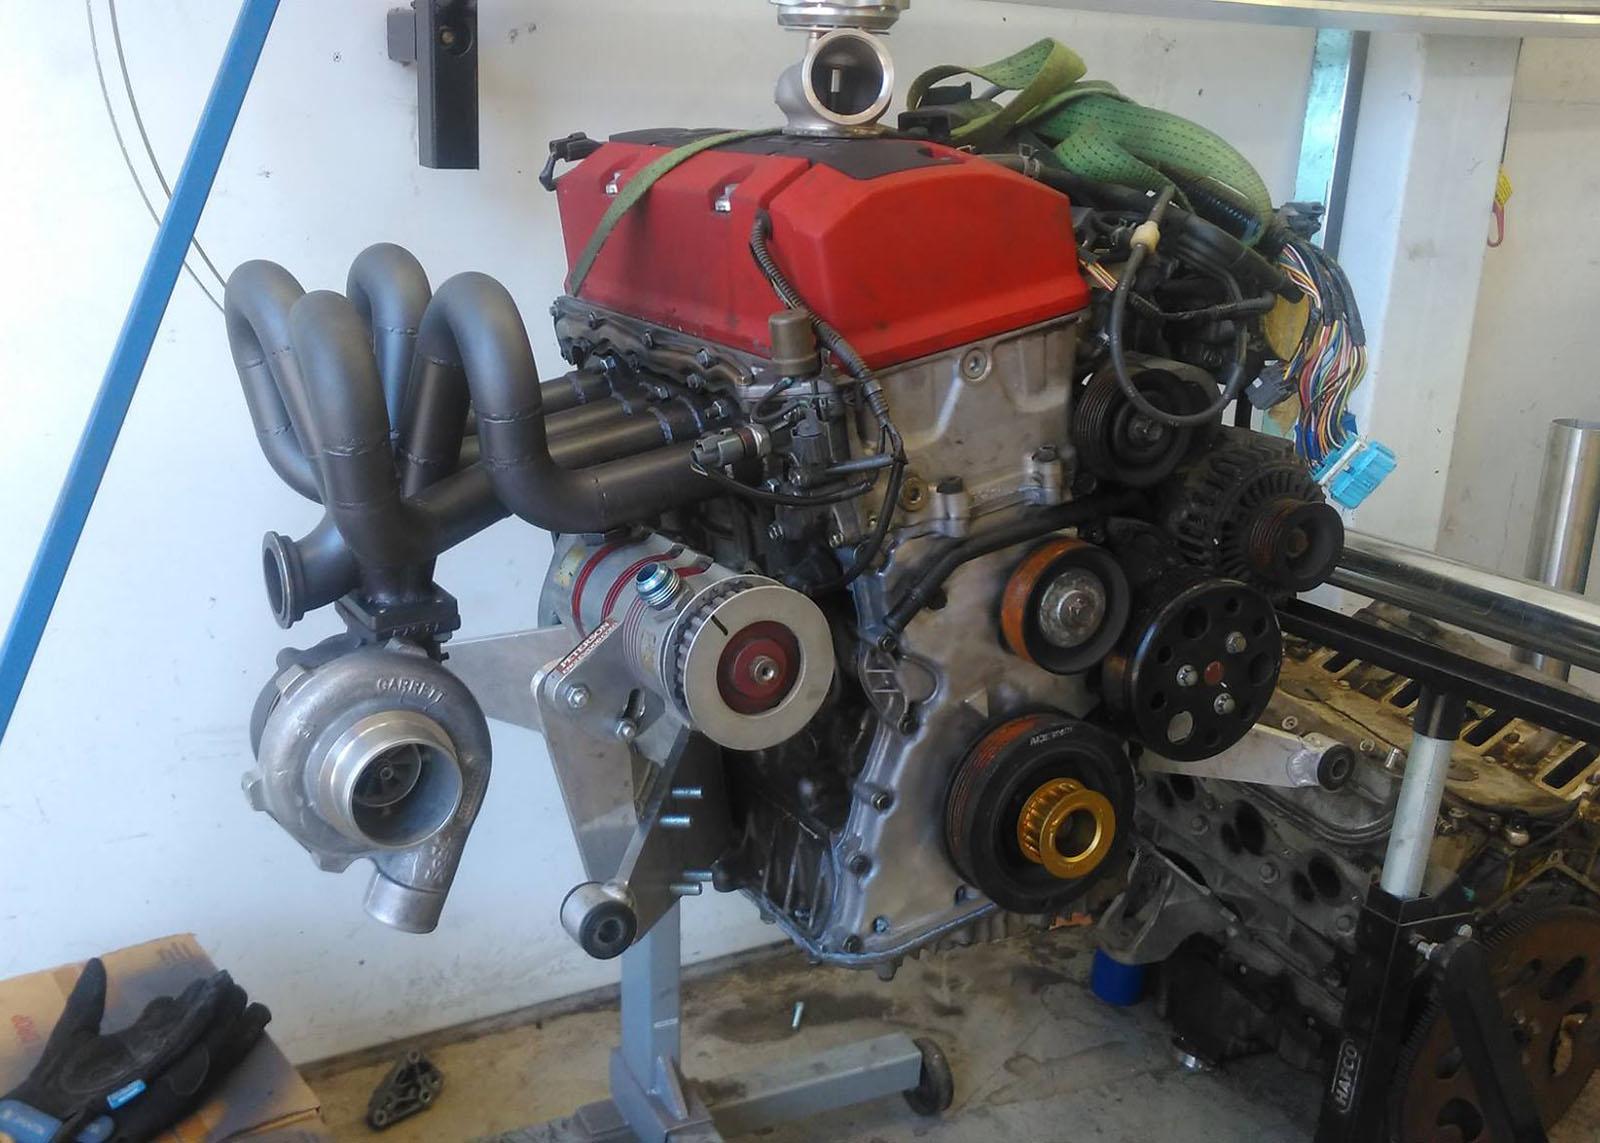 Turbo F20c Powered Boat Engine Swap Depot